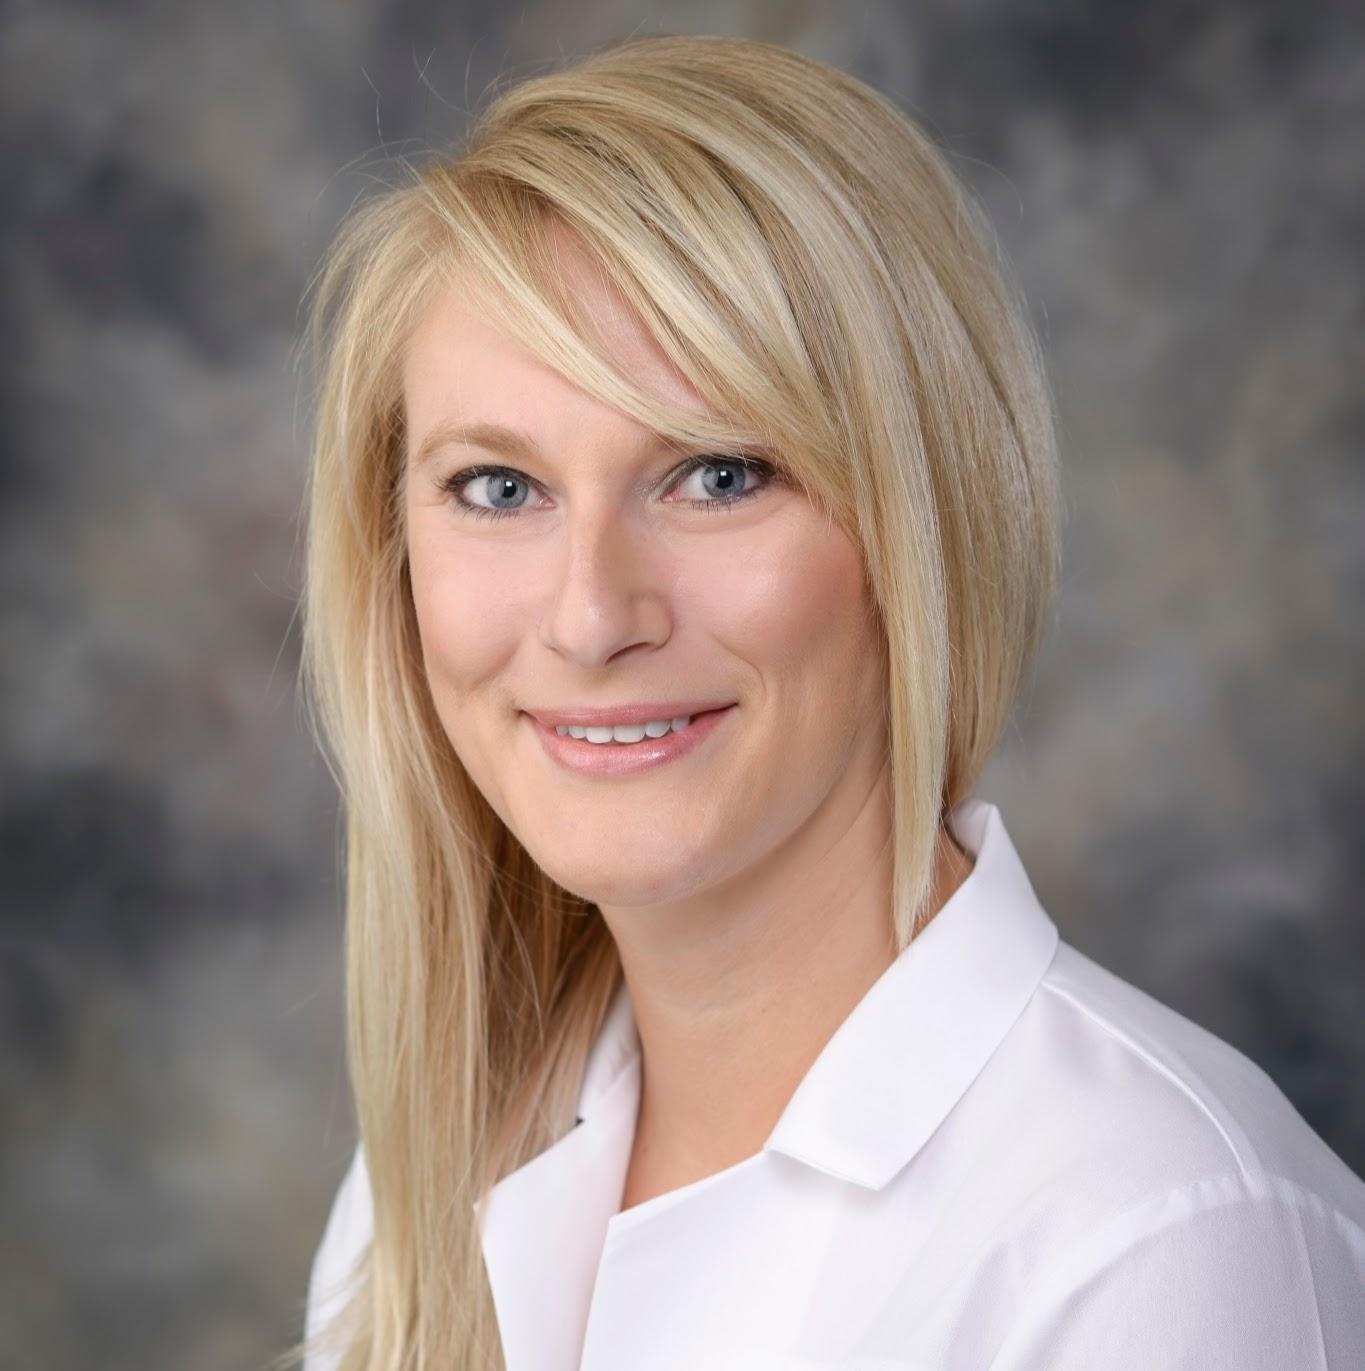 Kathryn Leigh Bauer, MD - Plano, TX 75024 - (469)303-3000 | ShowMeLocal.com